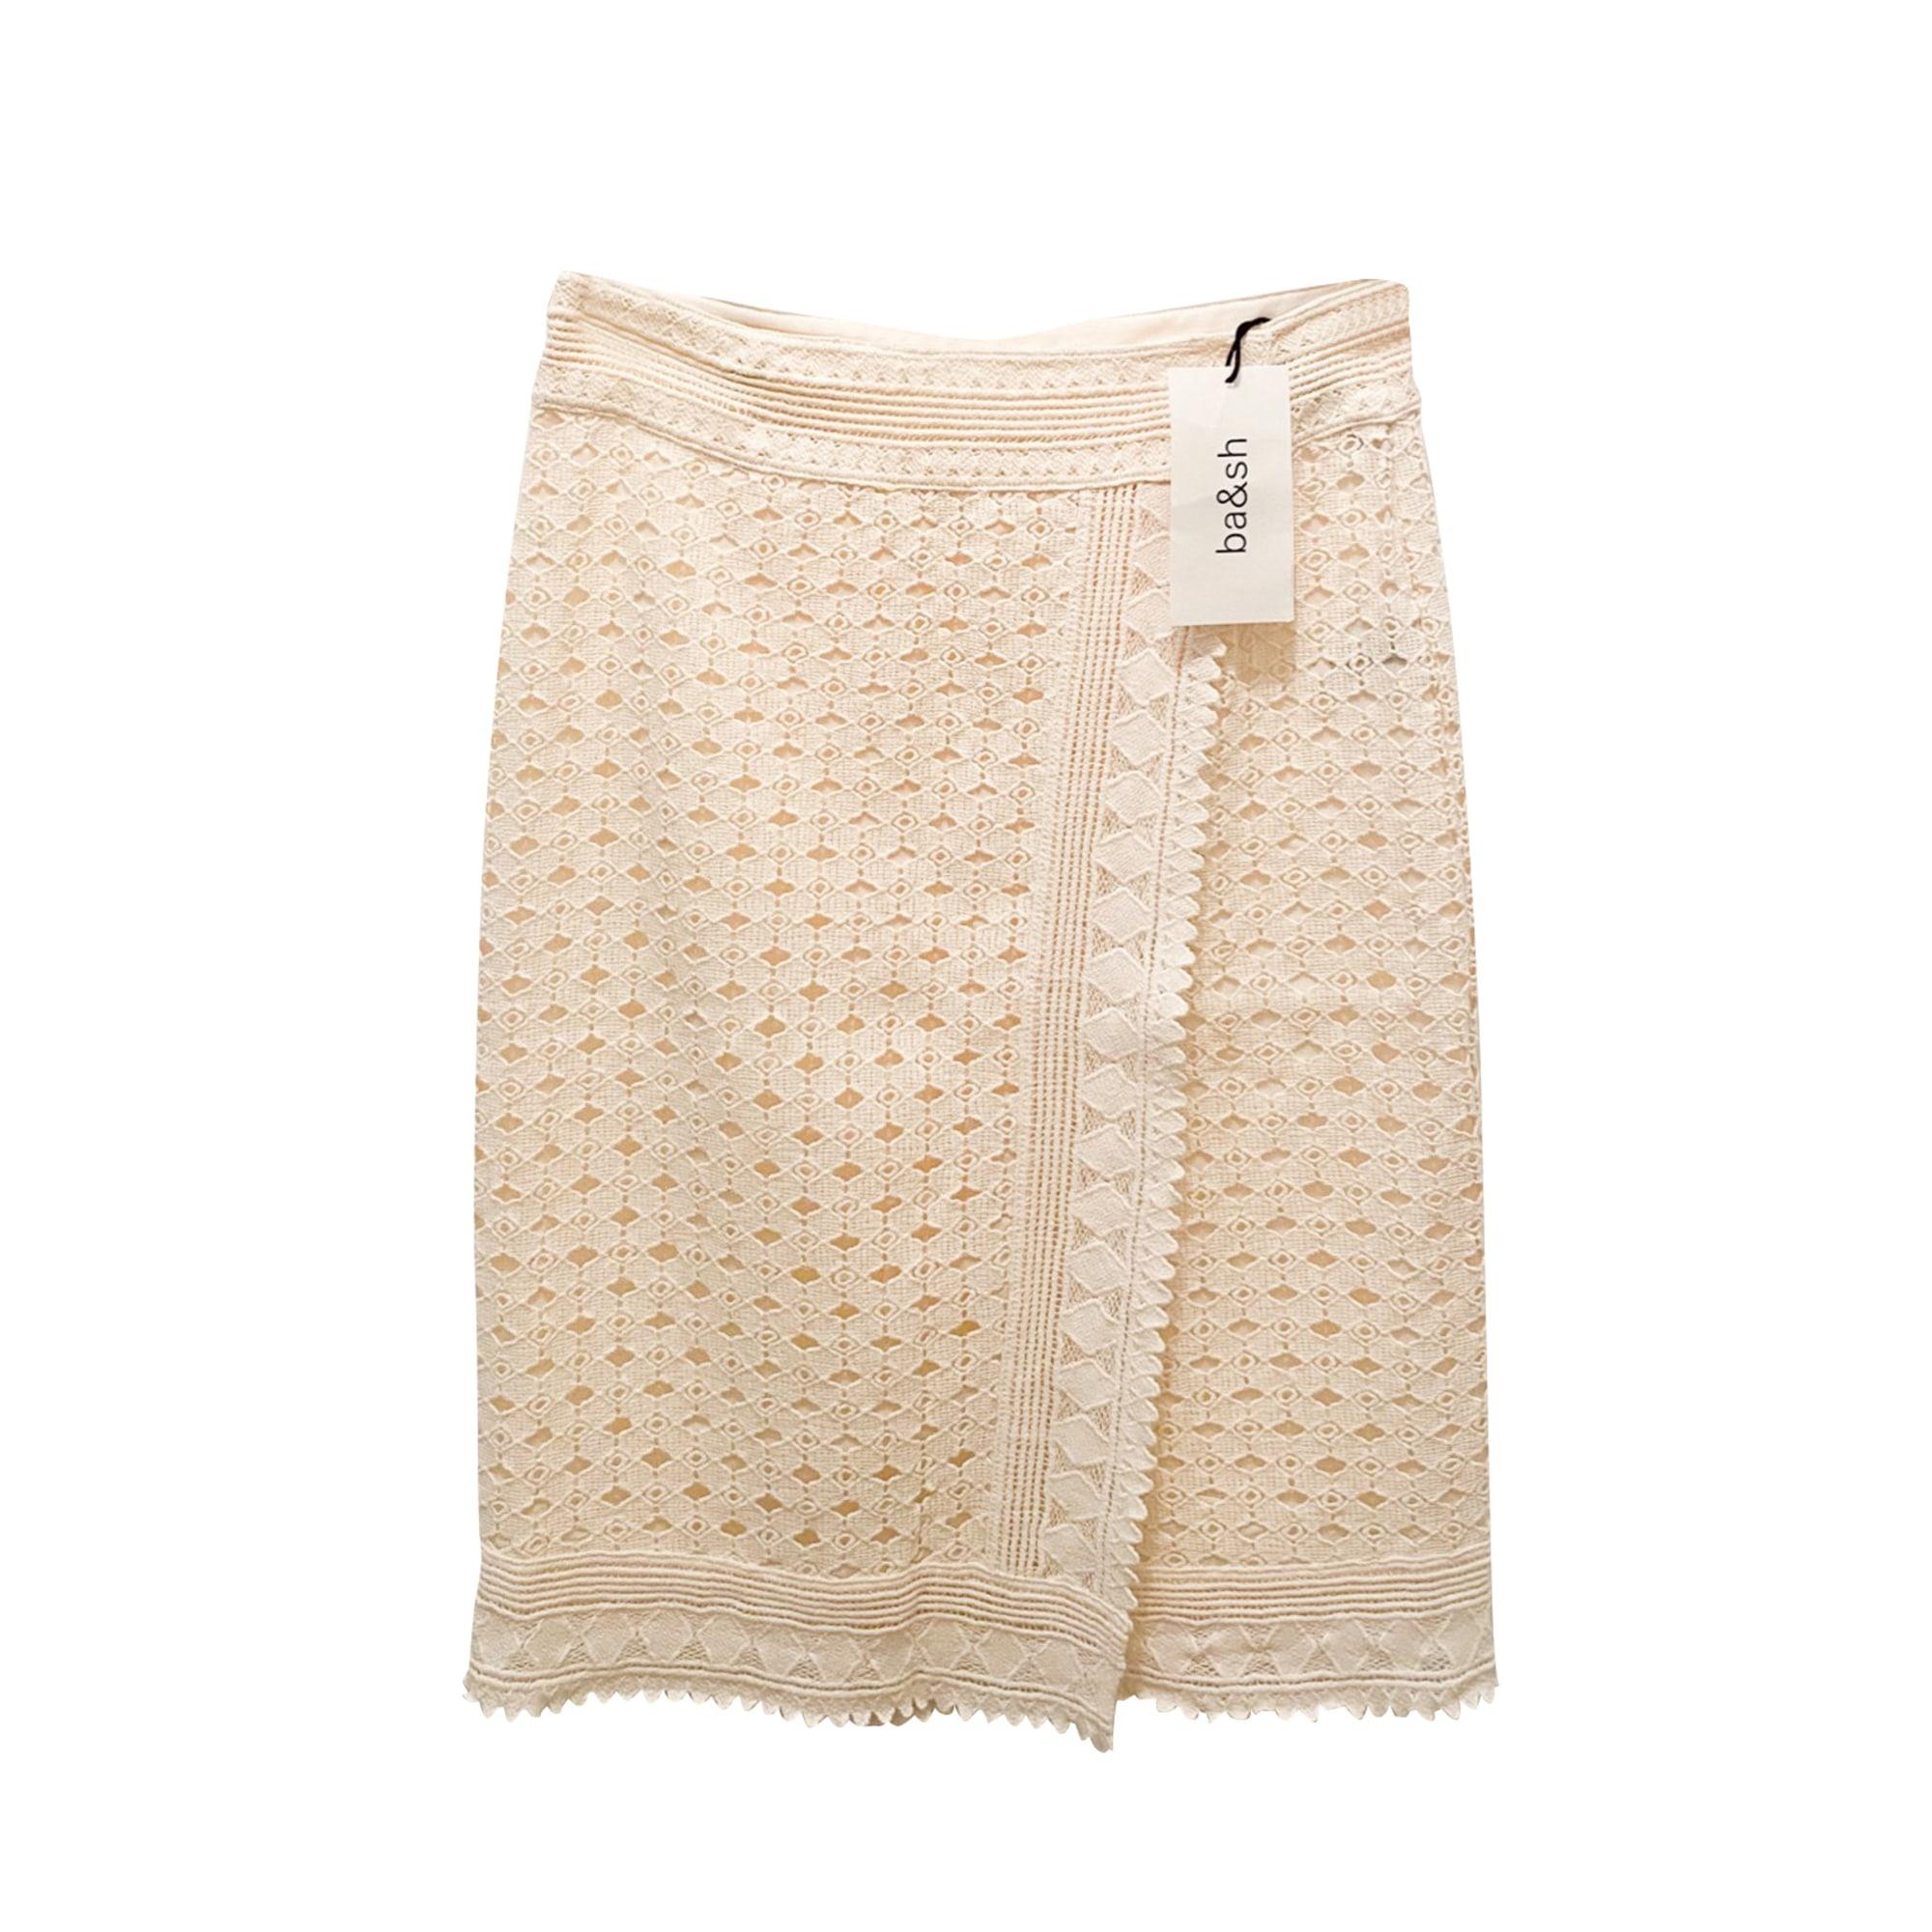 Jupe mi-longue BA&SH Blanc, blanc cassé, écru